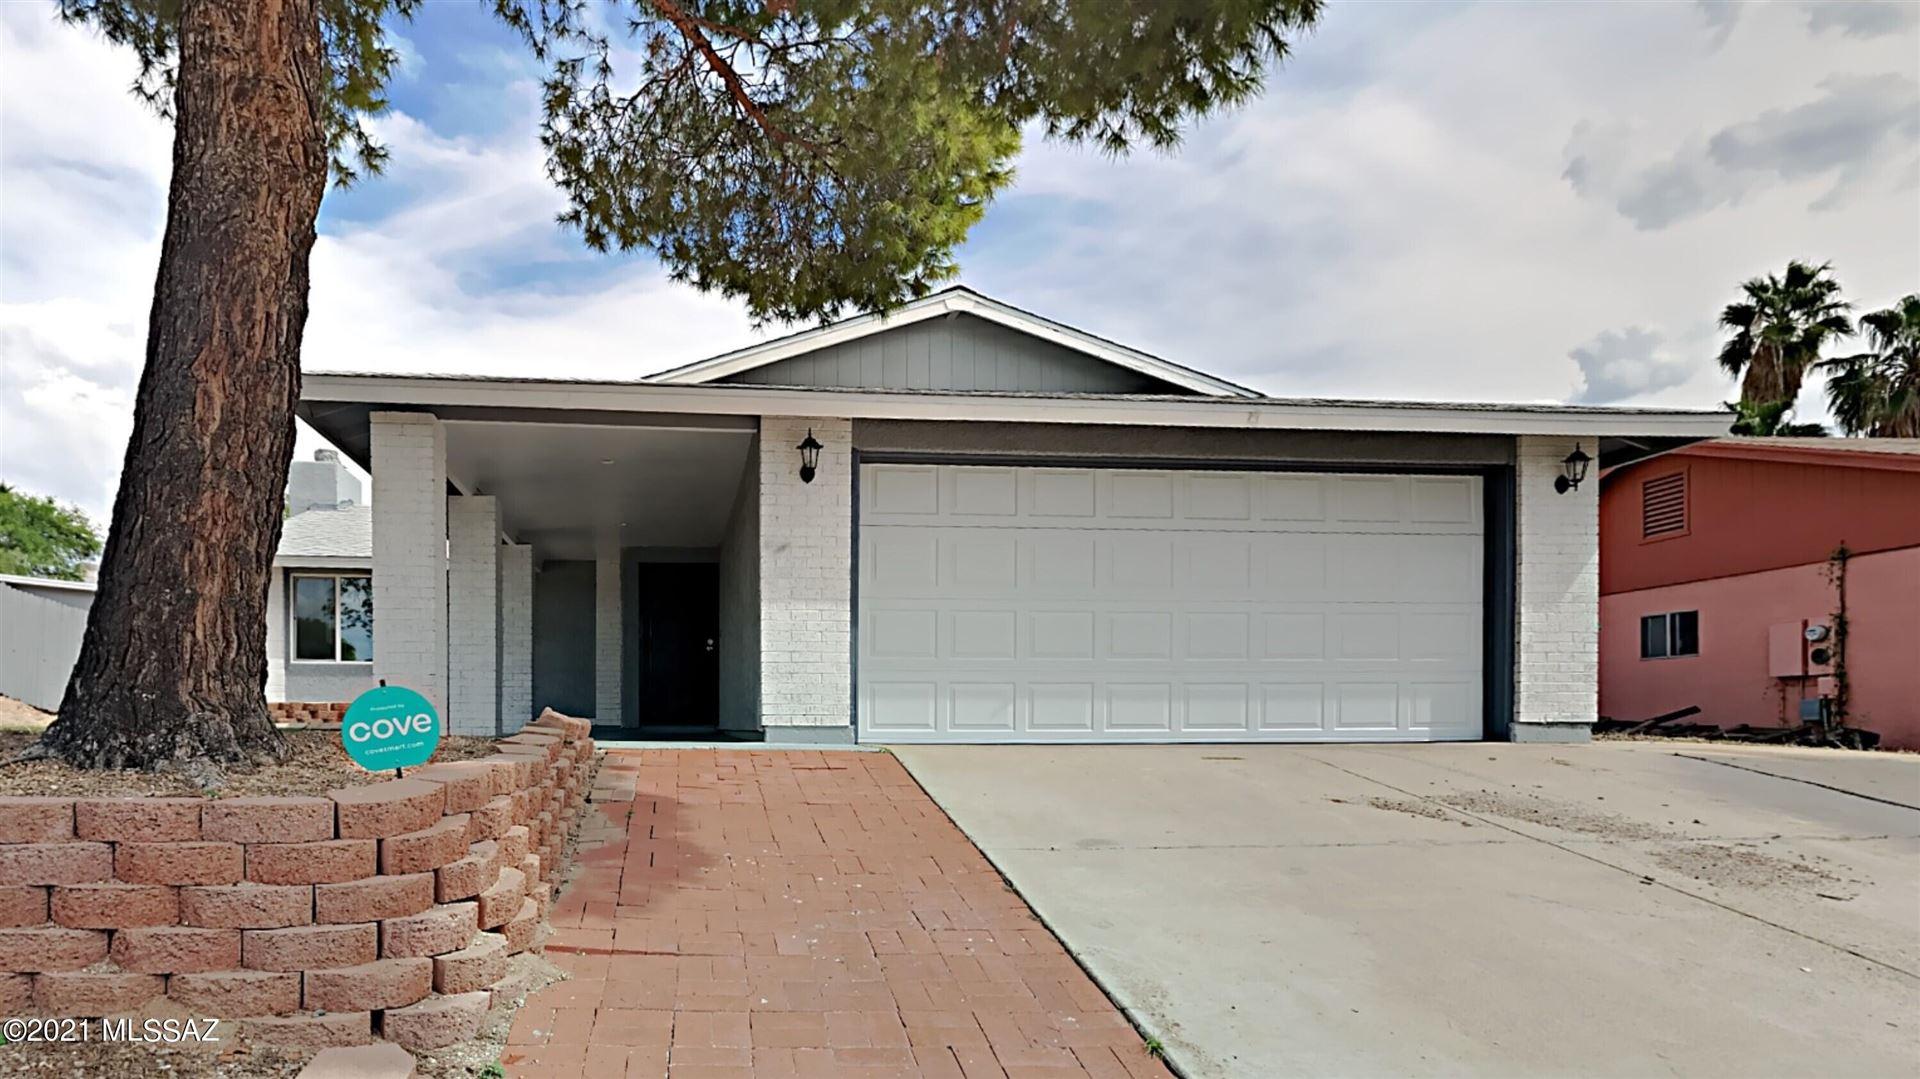 7416 N Shirley Lane, Tucson, AZ 85741 - MLS#: 22125886